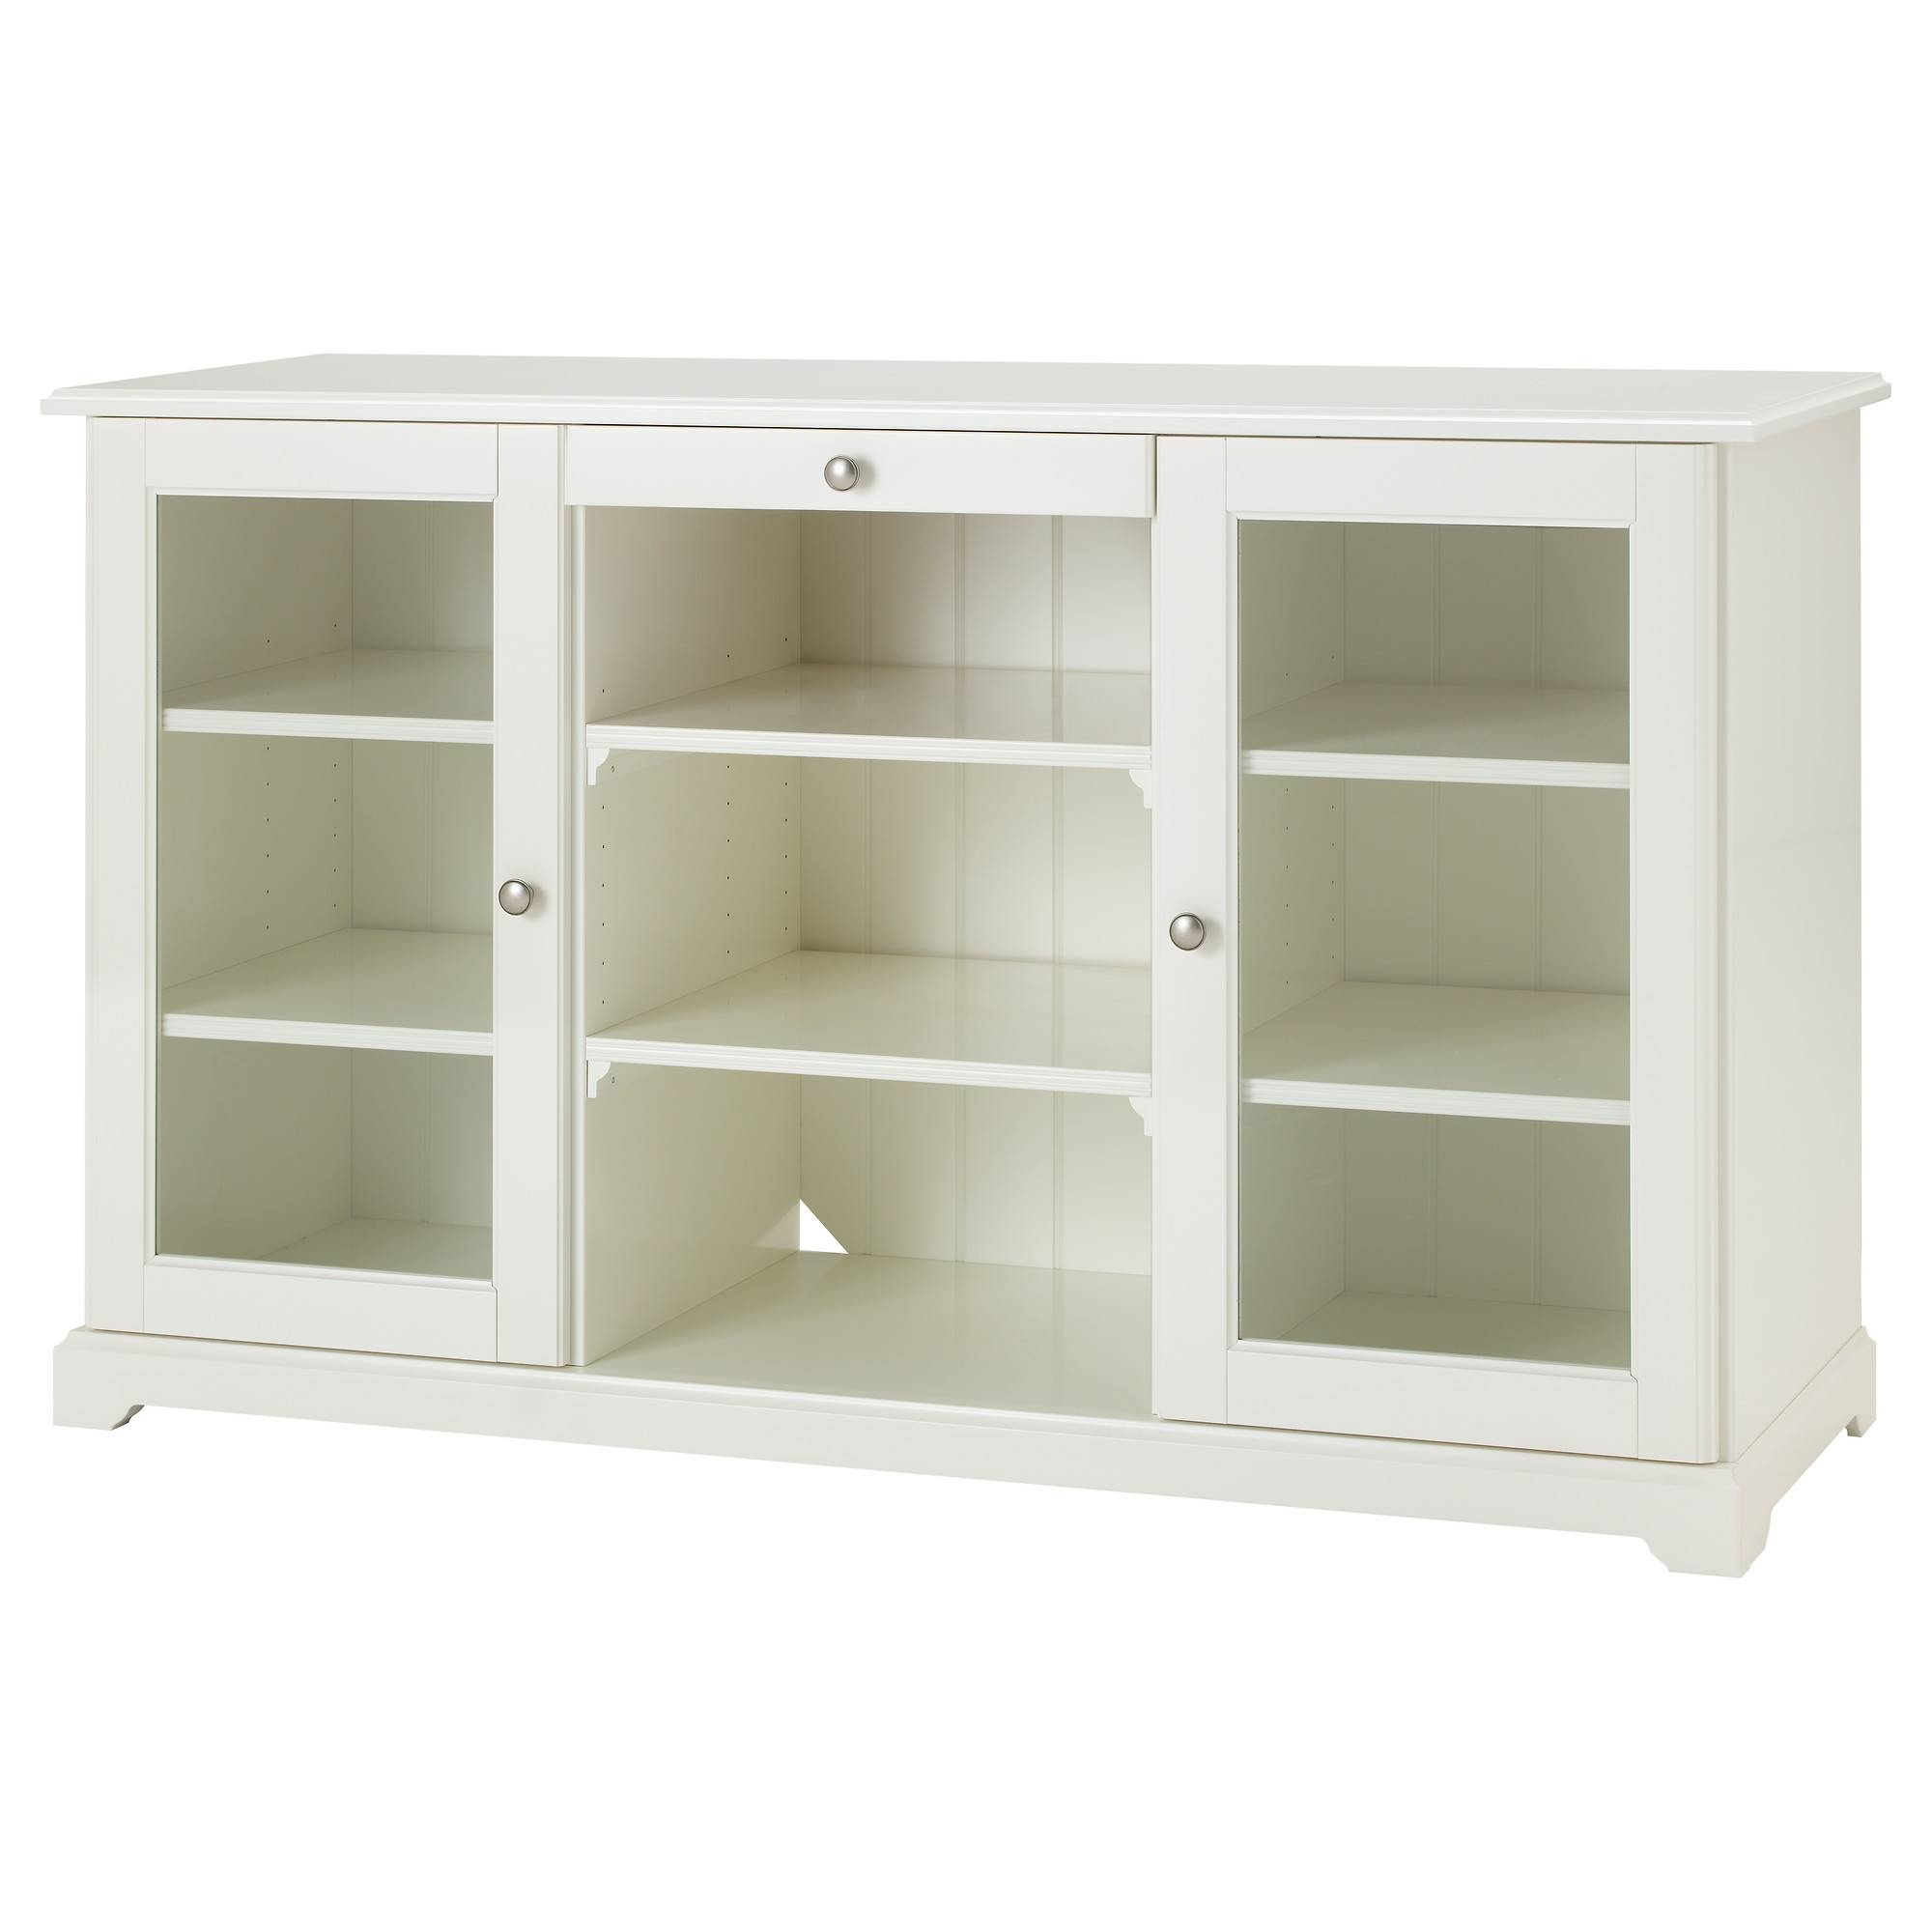 Sideboards: Marvellous Dark Sideboard Furniture Sideboard Buffet for Dark Sideboards Furniture (Image 28 of 30)